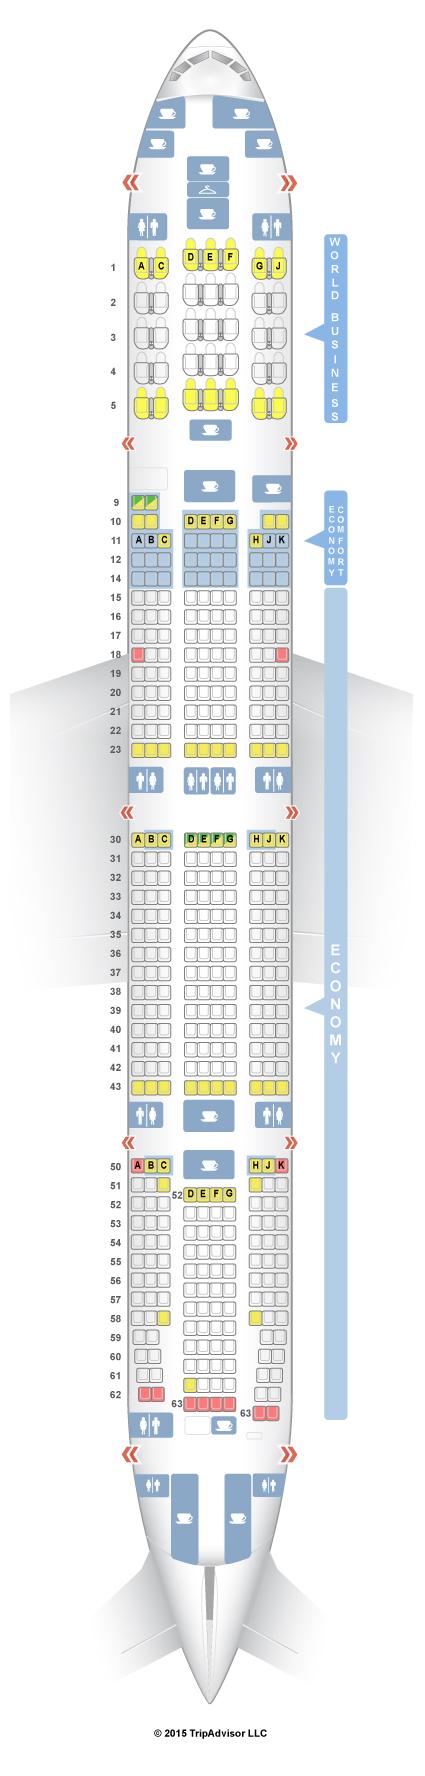 SeatGuru Seat Map KLM